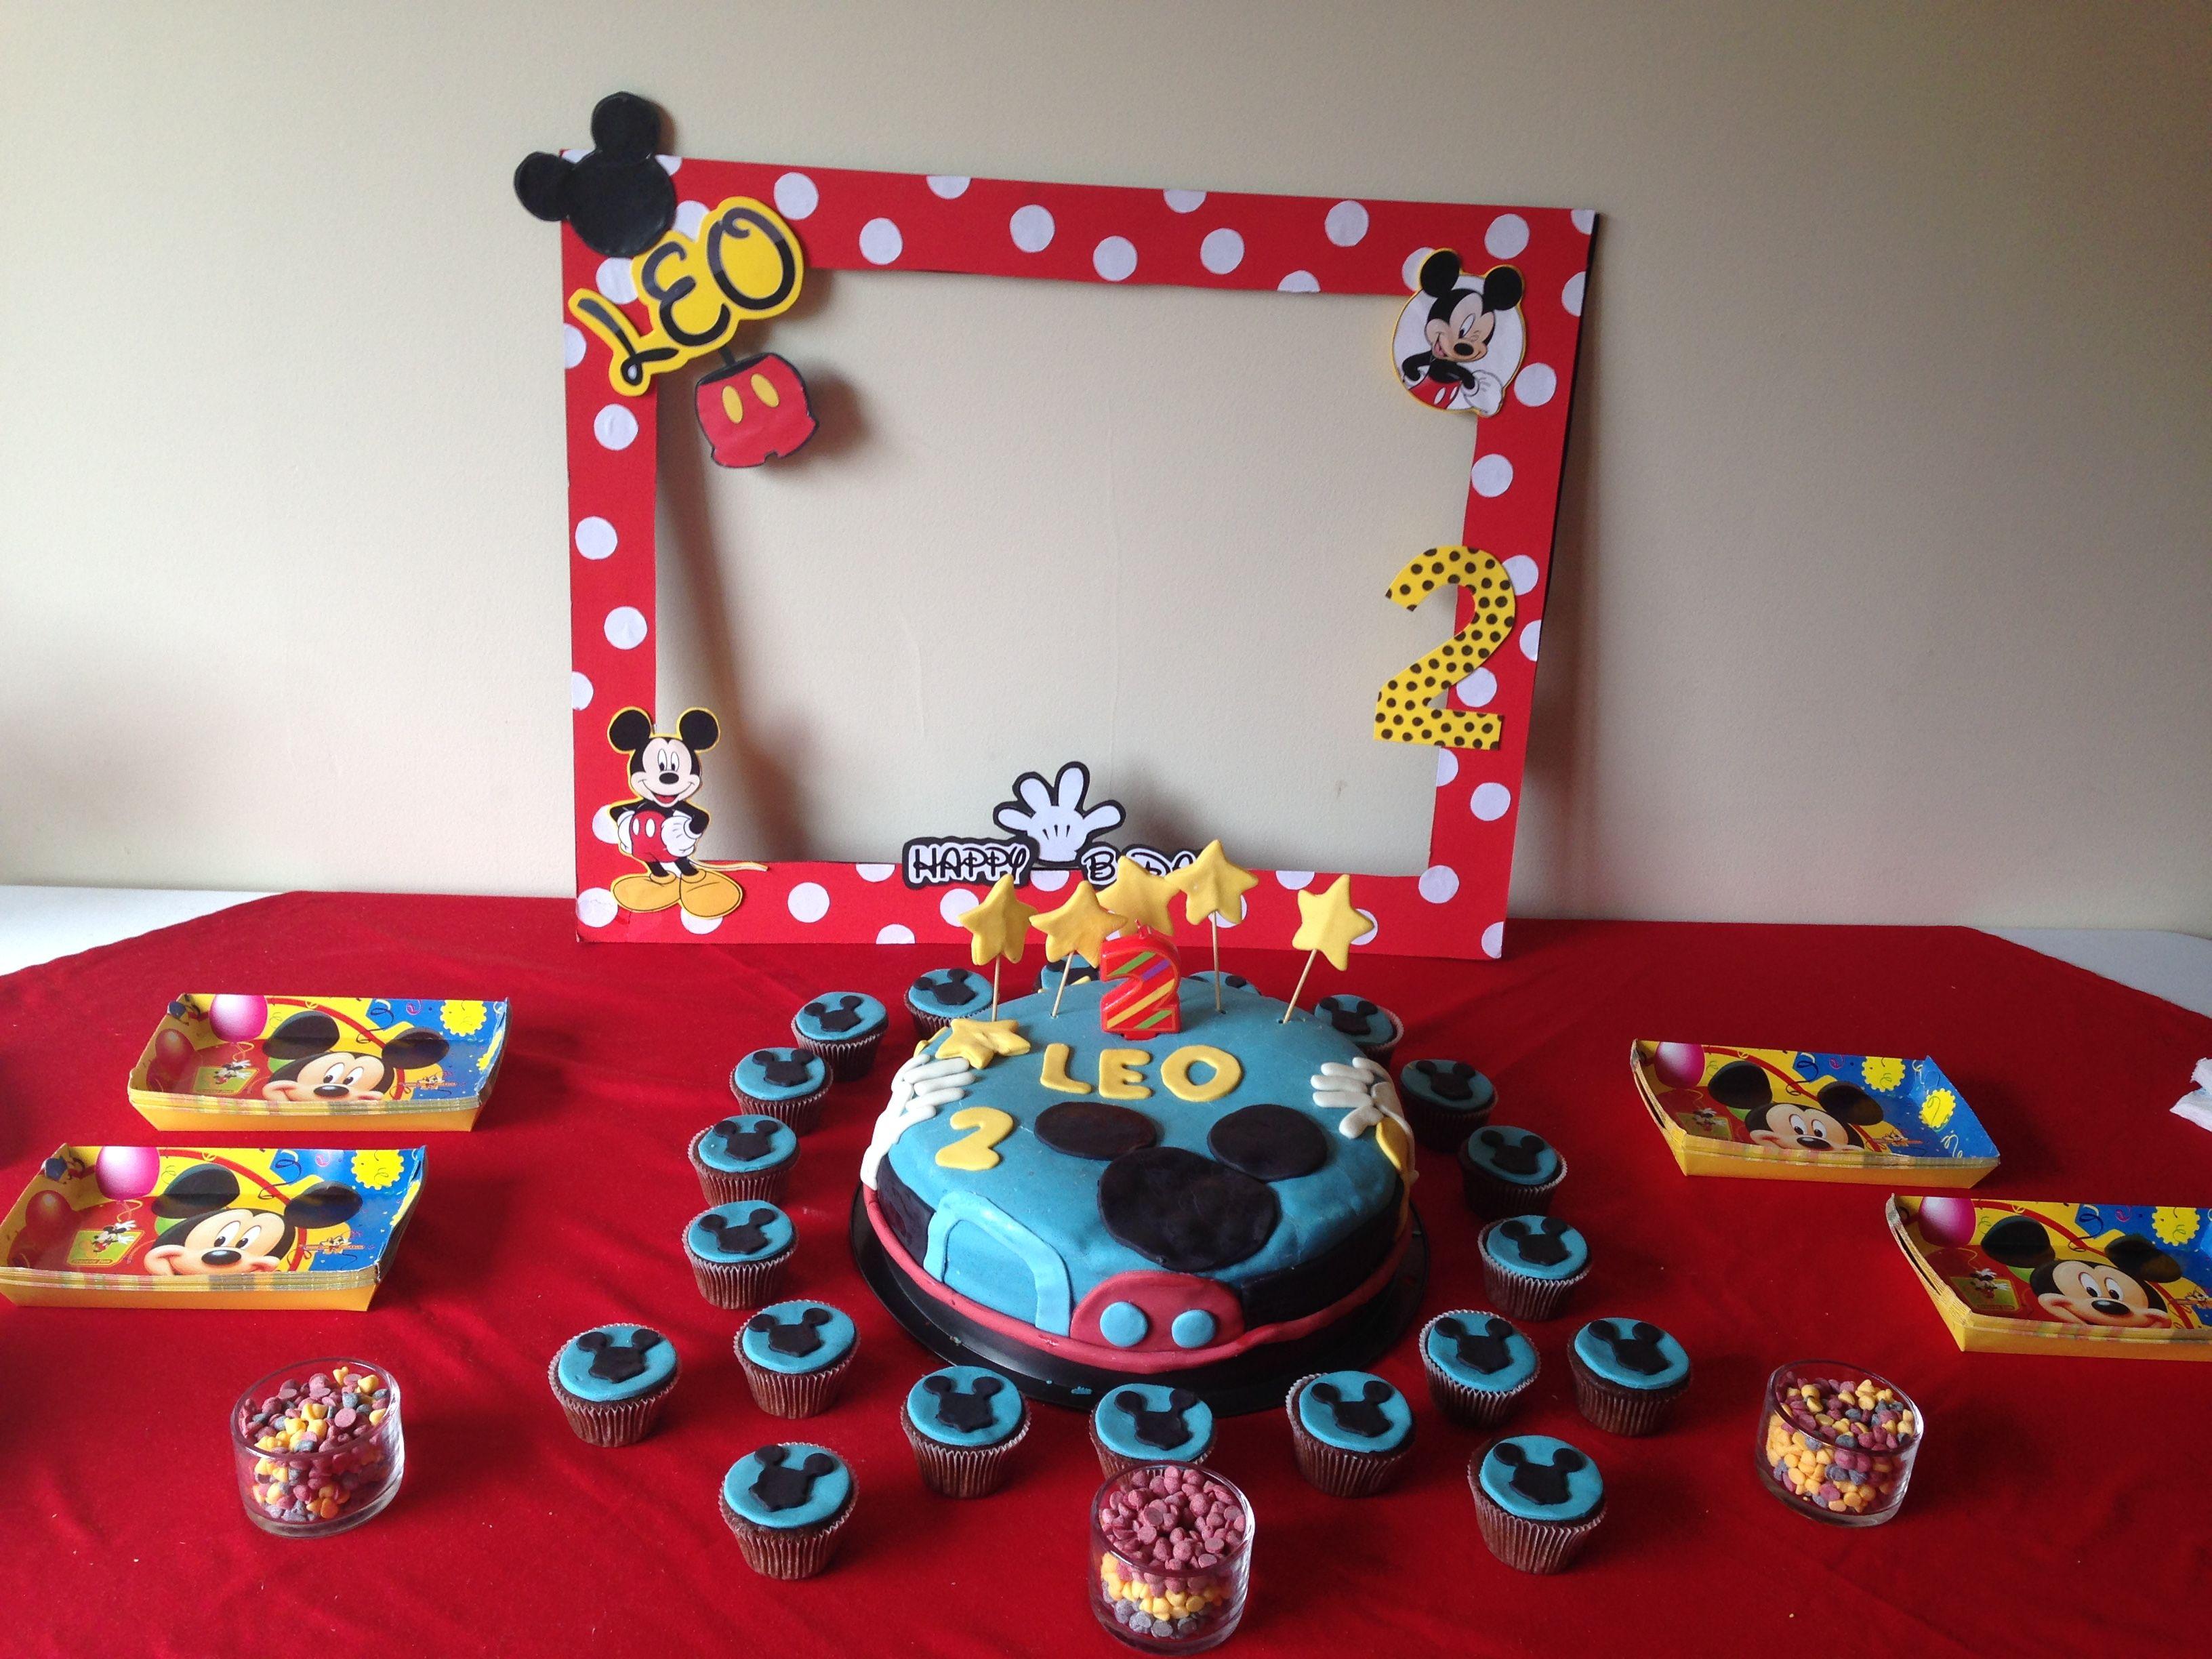 mesa de pastel con tema de mickey mouse cupcakes de fondant recipientes con